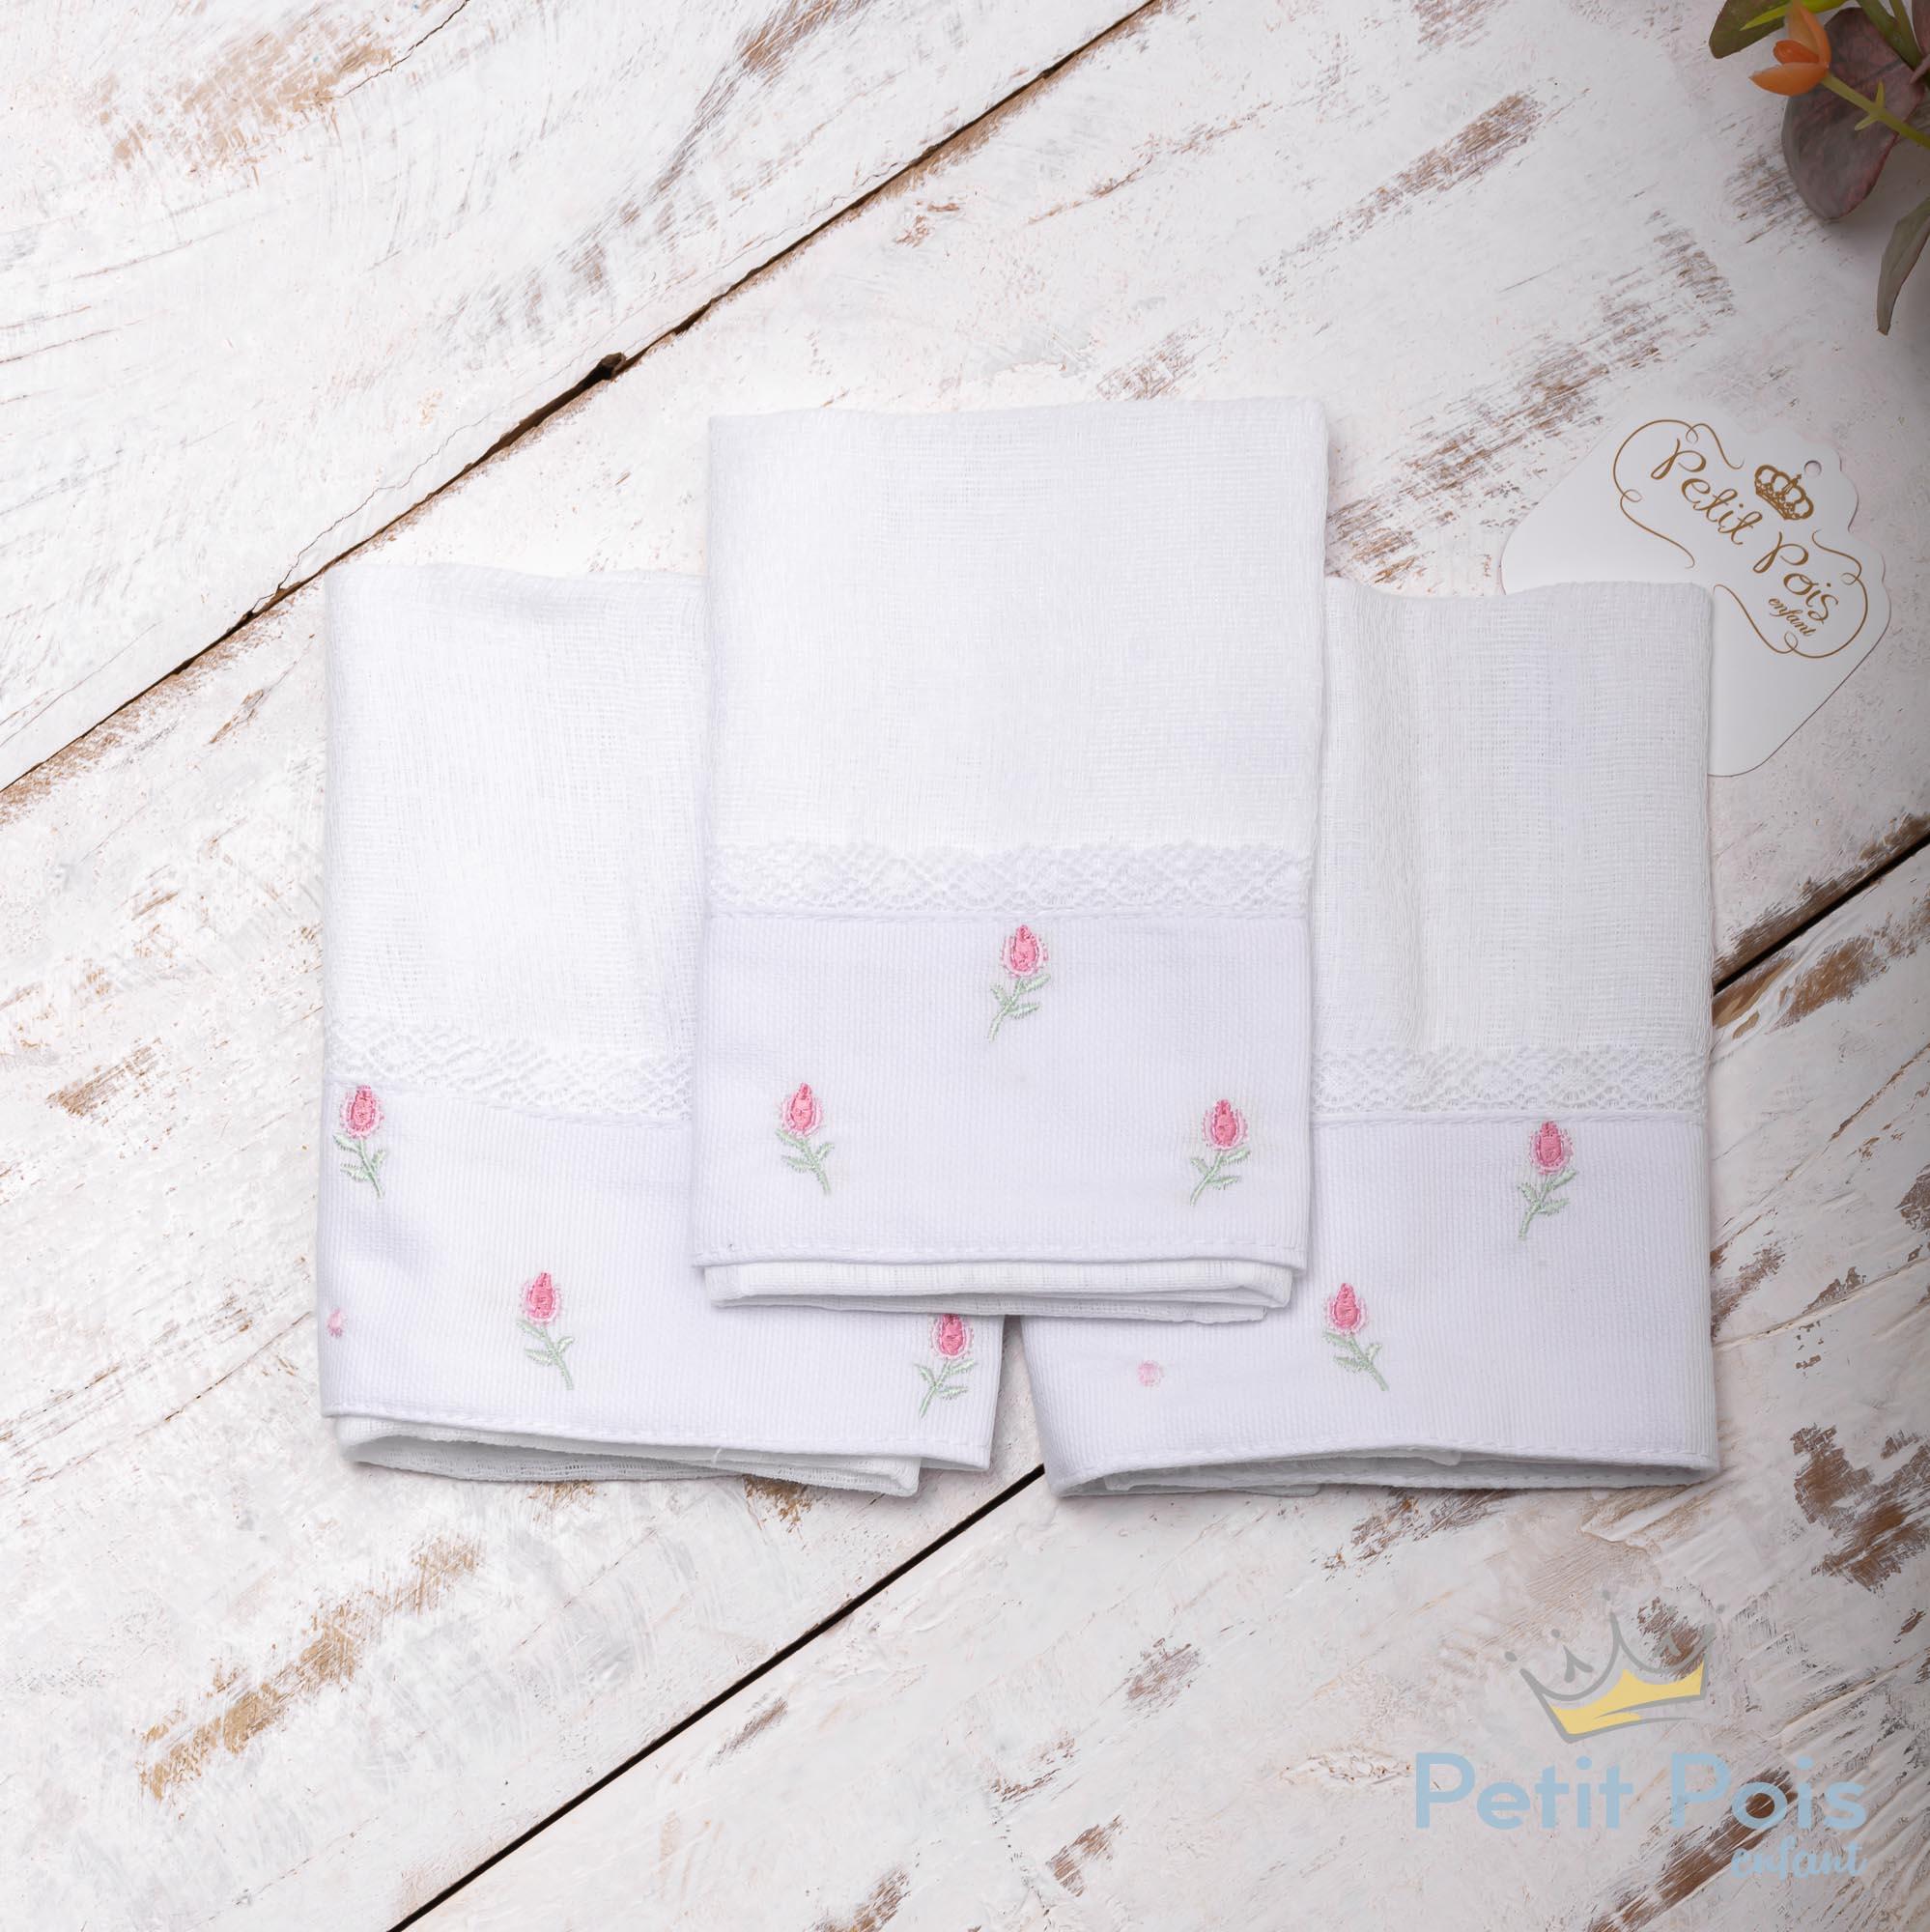 Kit toalha de boca tulipa 3 peças - Branco e rosa